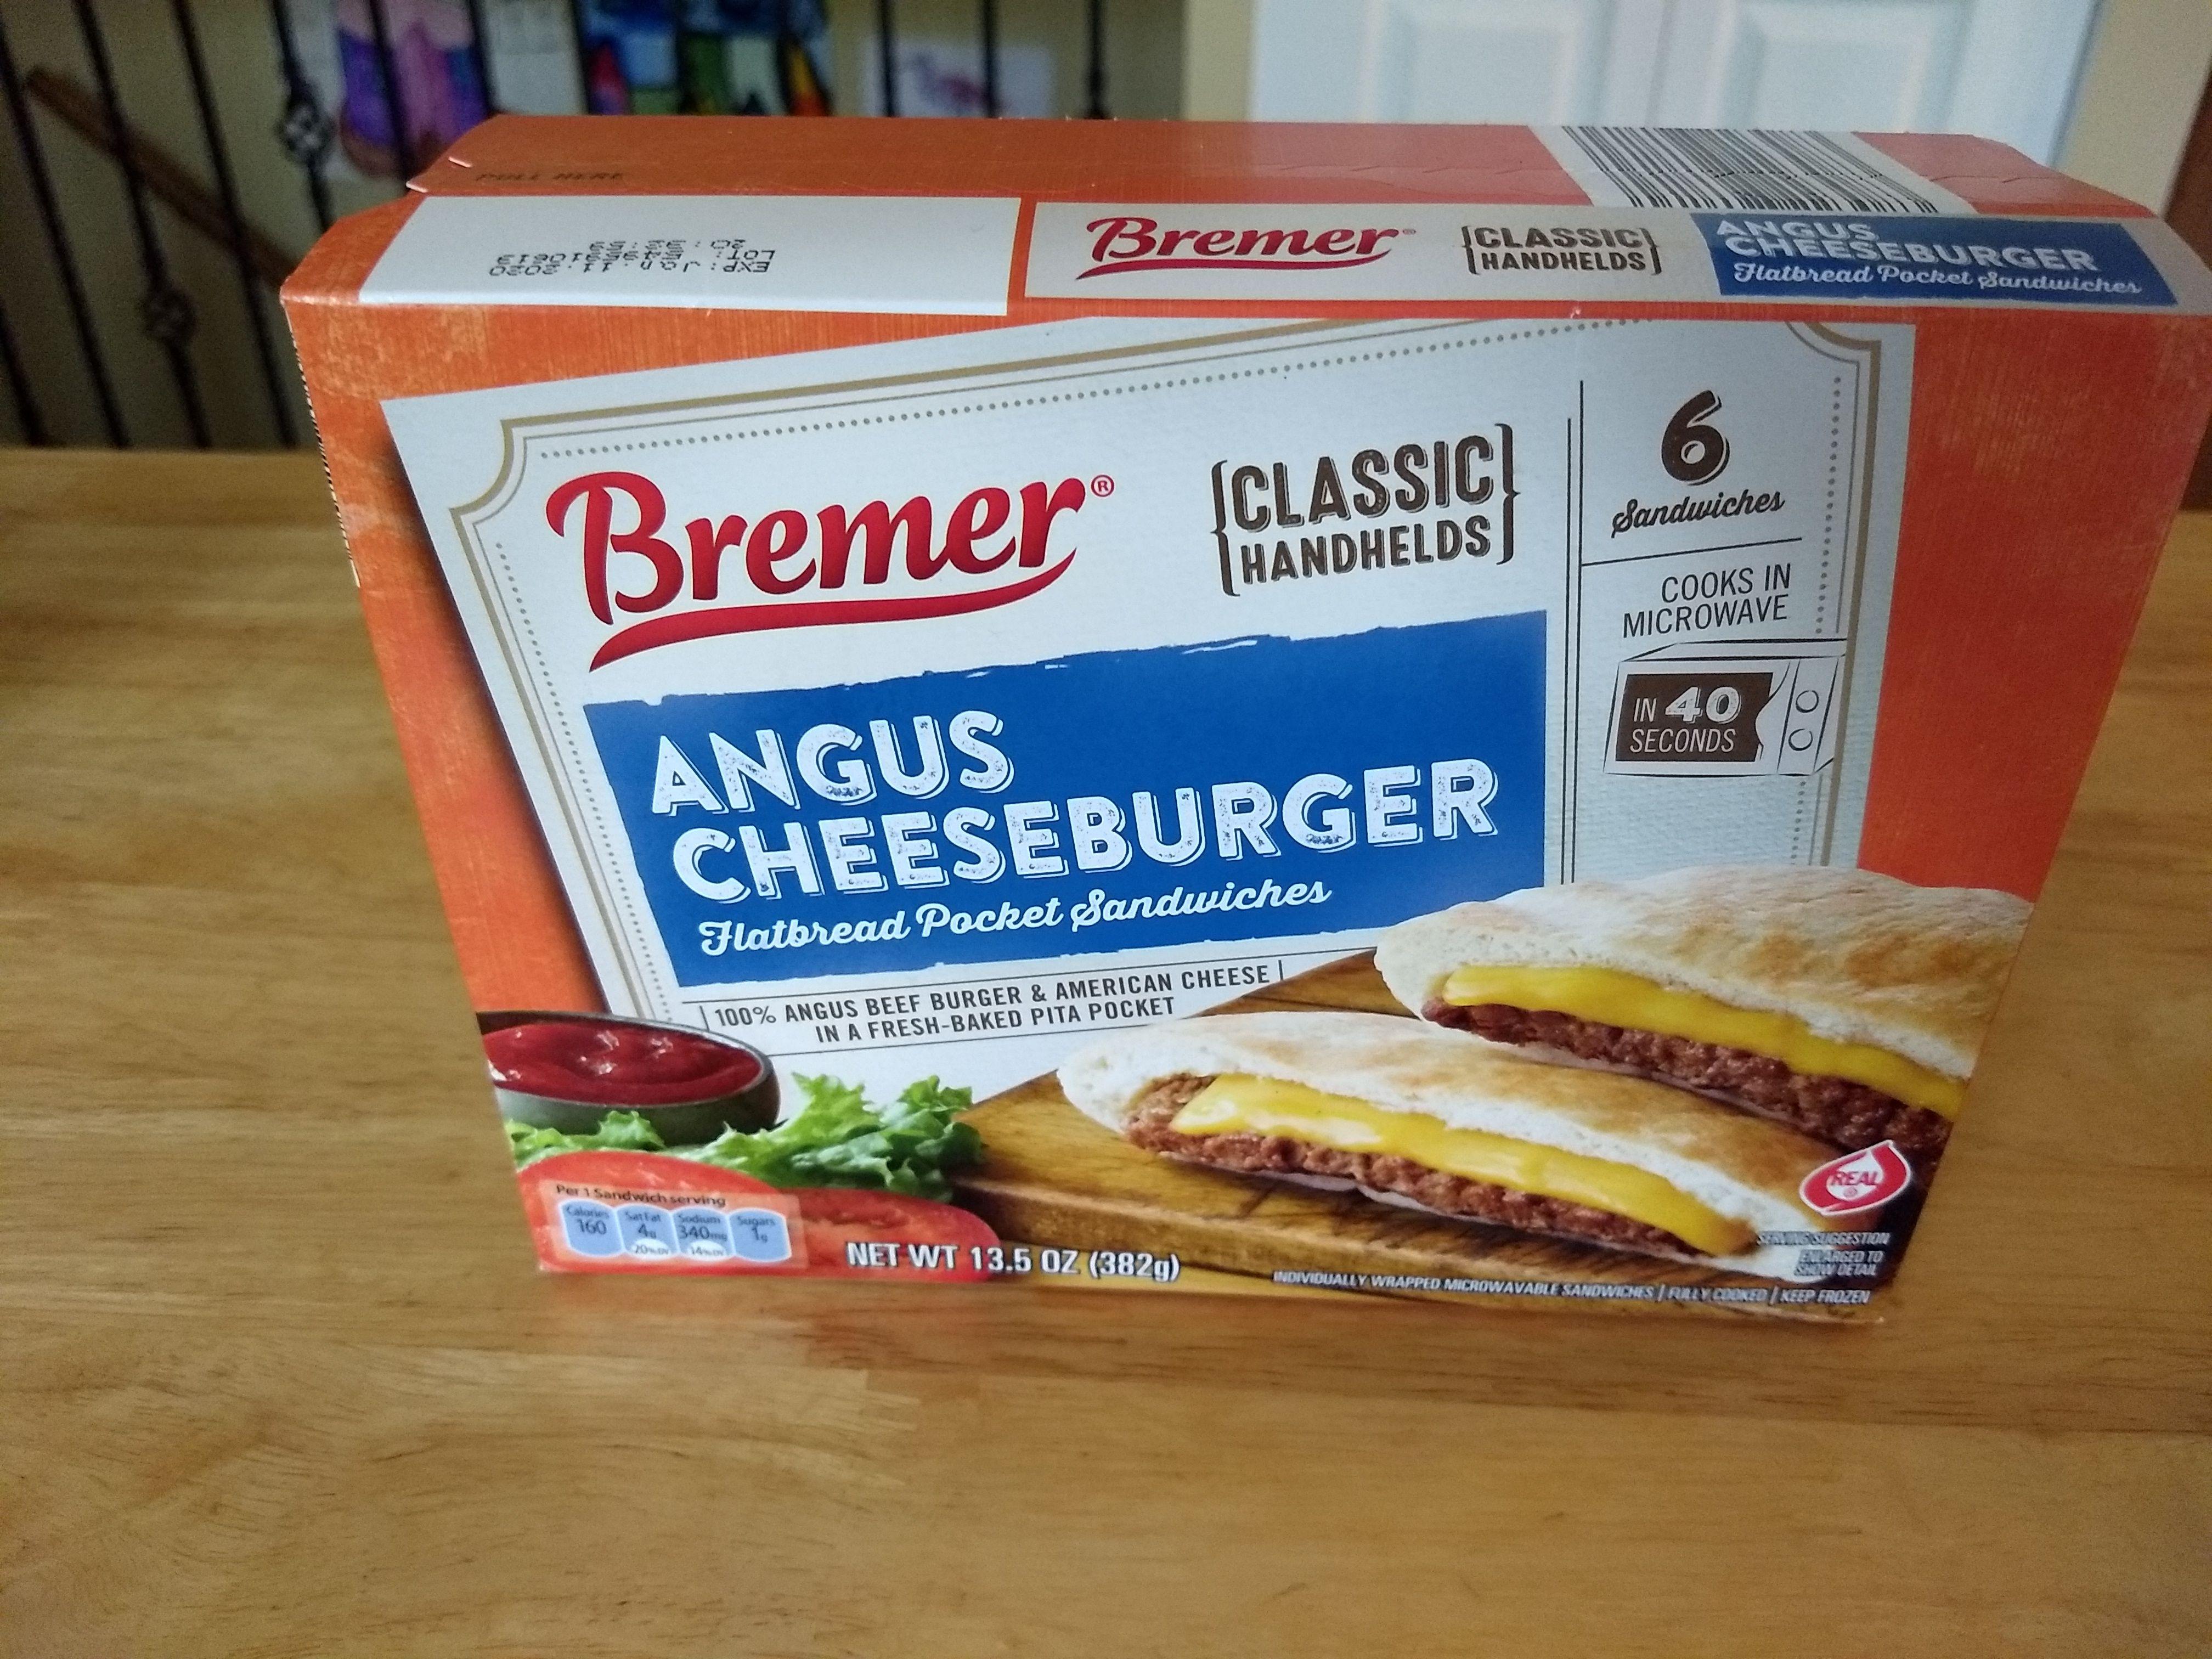 Bremer Chicken Melts Angus Cheeseburger Flatbread Pocket